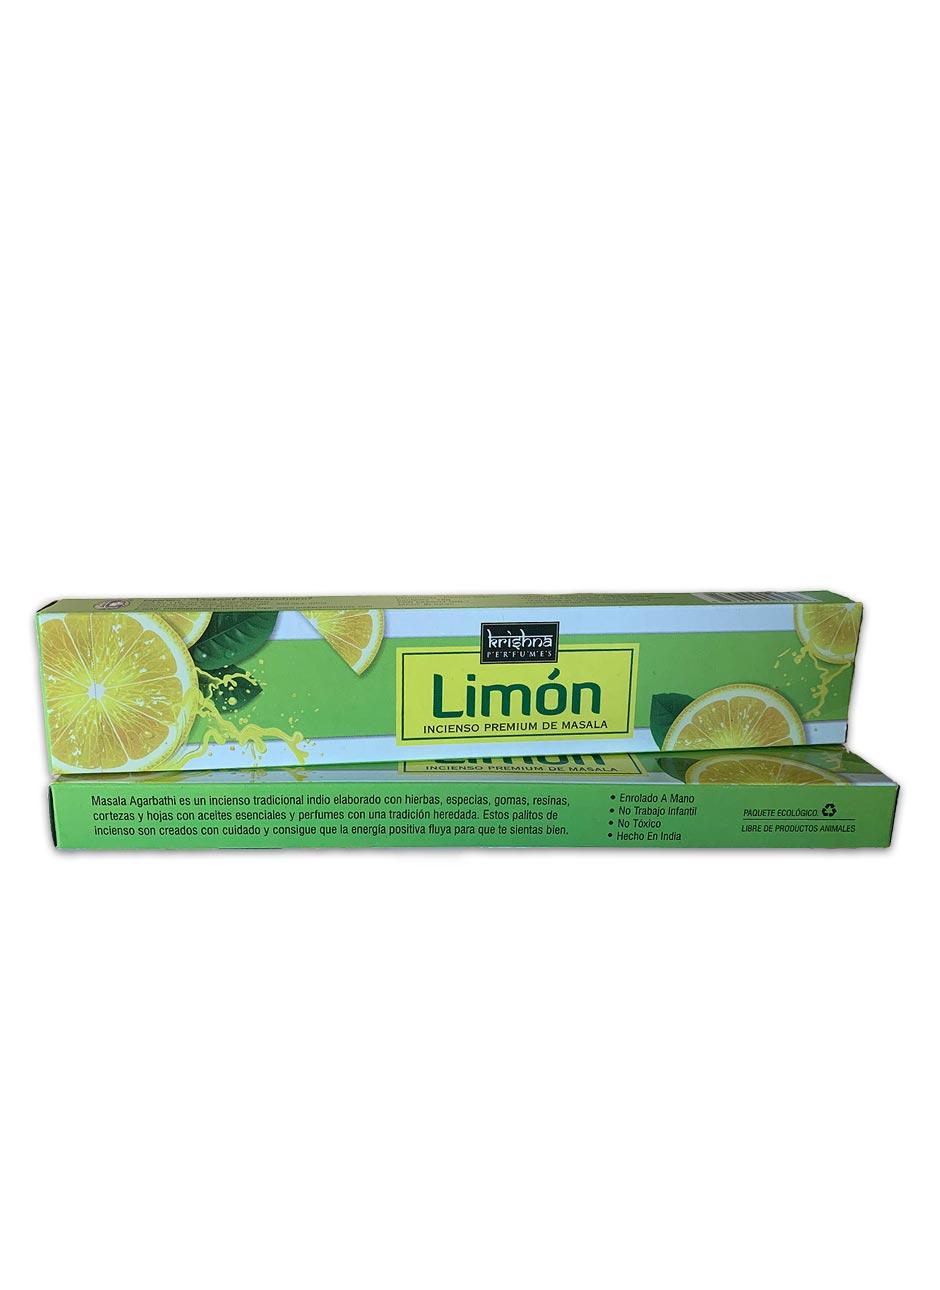 Incienso Krishna Premium Limón